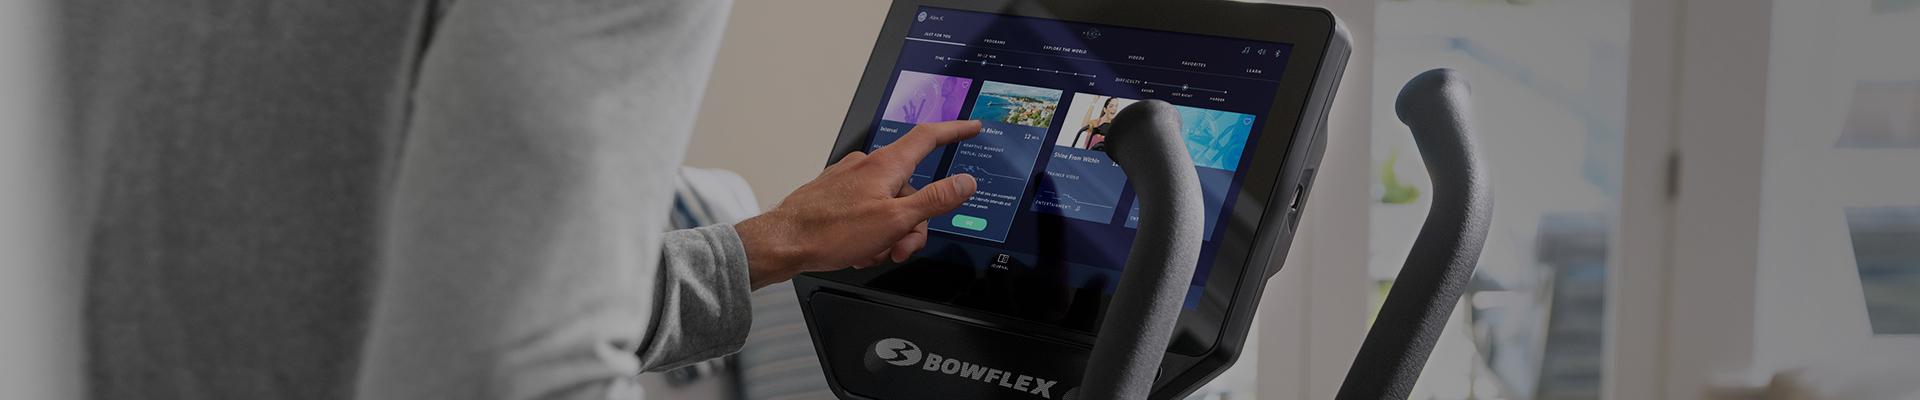 Bowflex Apps